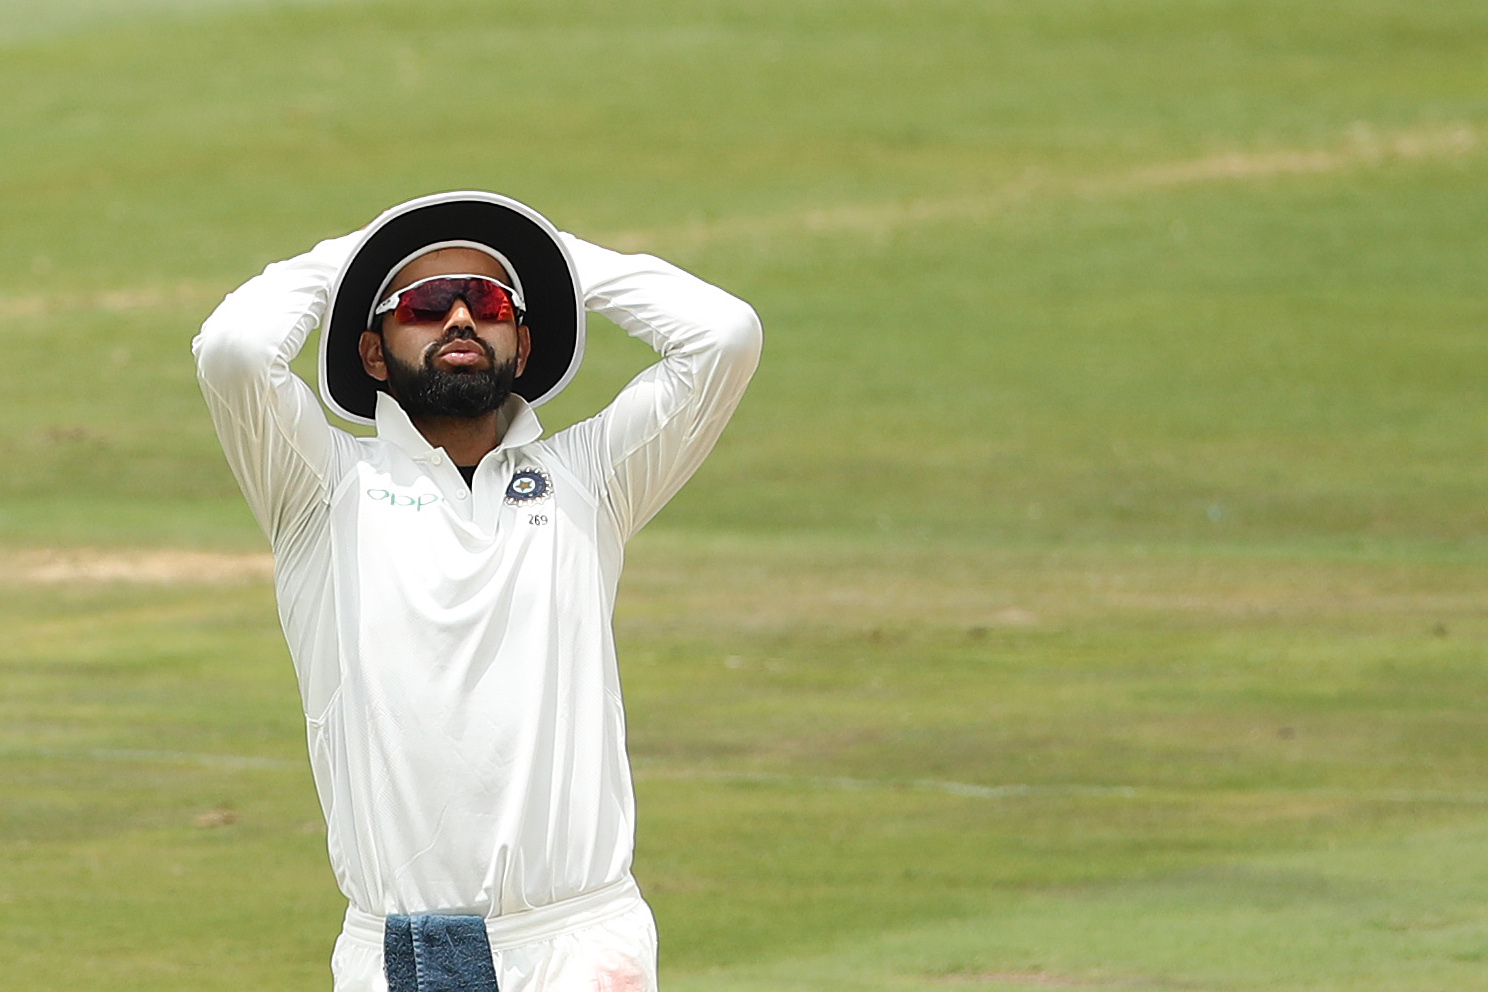 This was Virat Kohli's first Test series defeat as captain (Image: Ron Gaunt/BCCI)